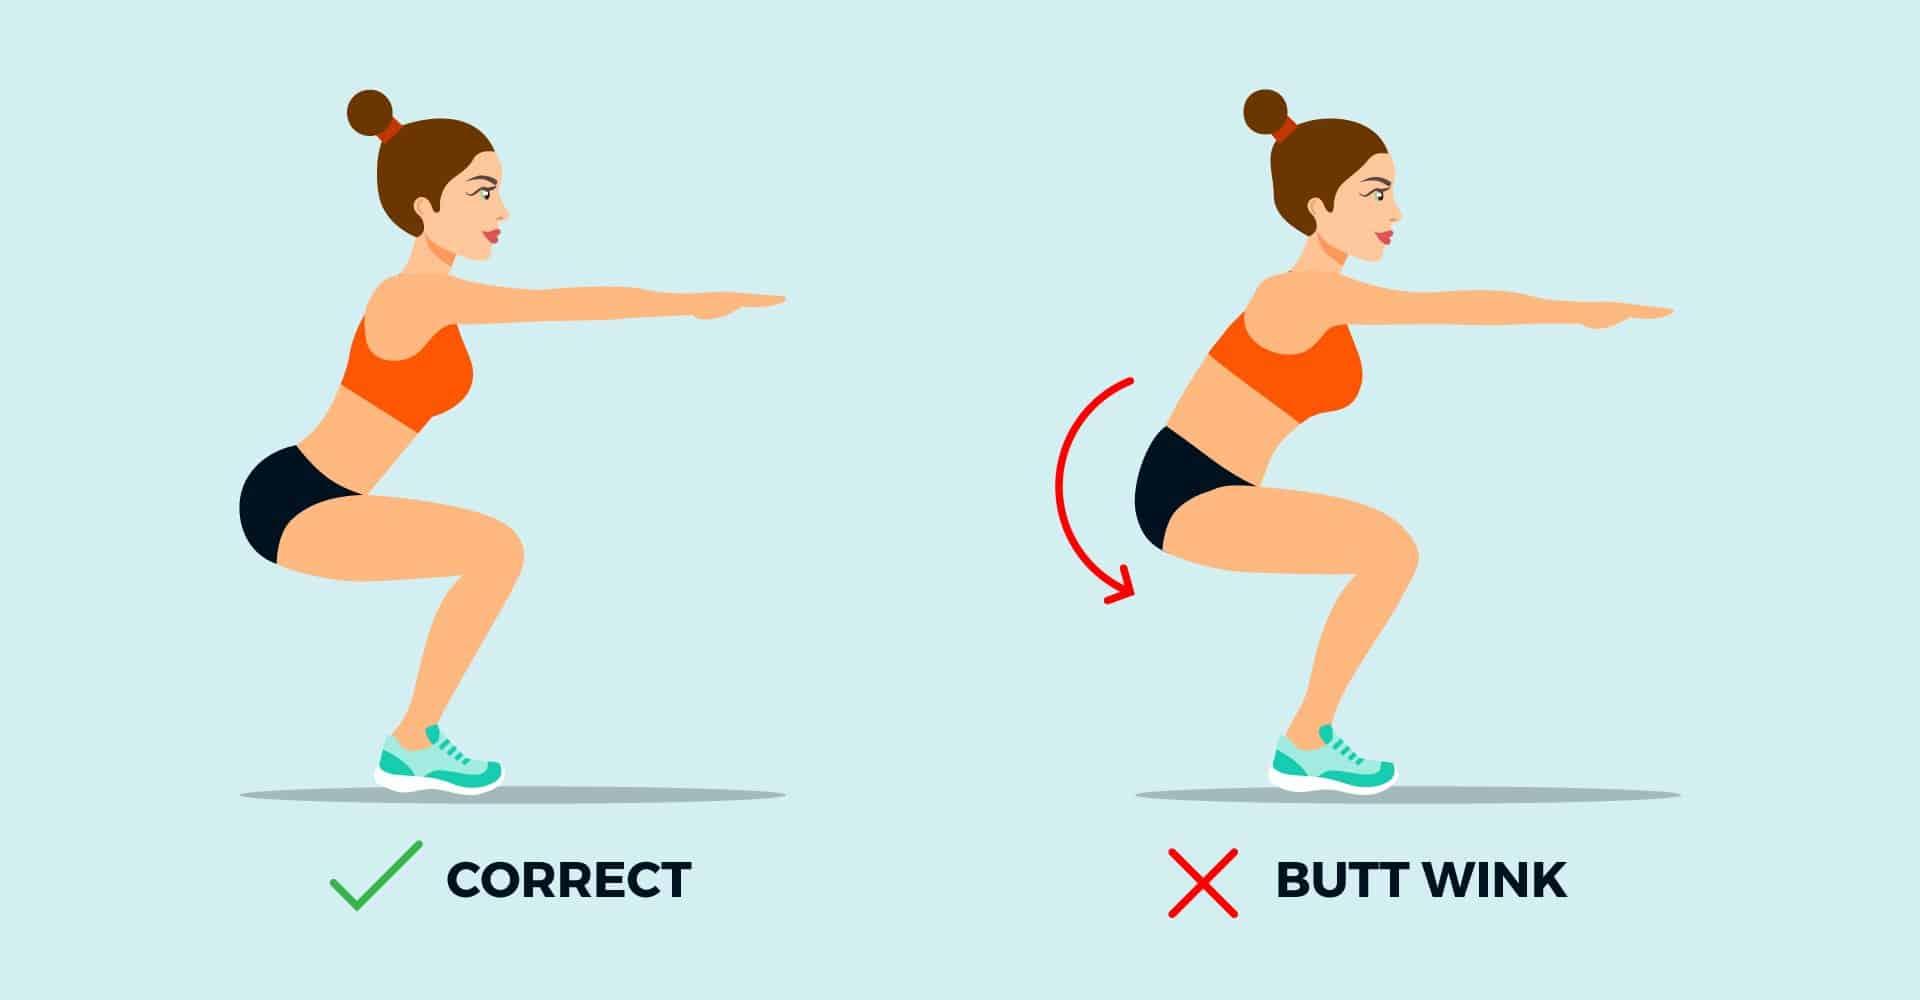 butt wink ejercicios basicos